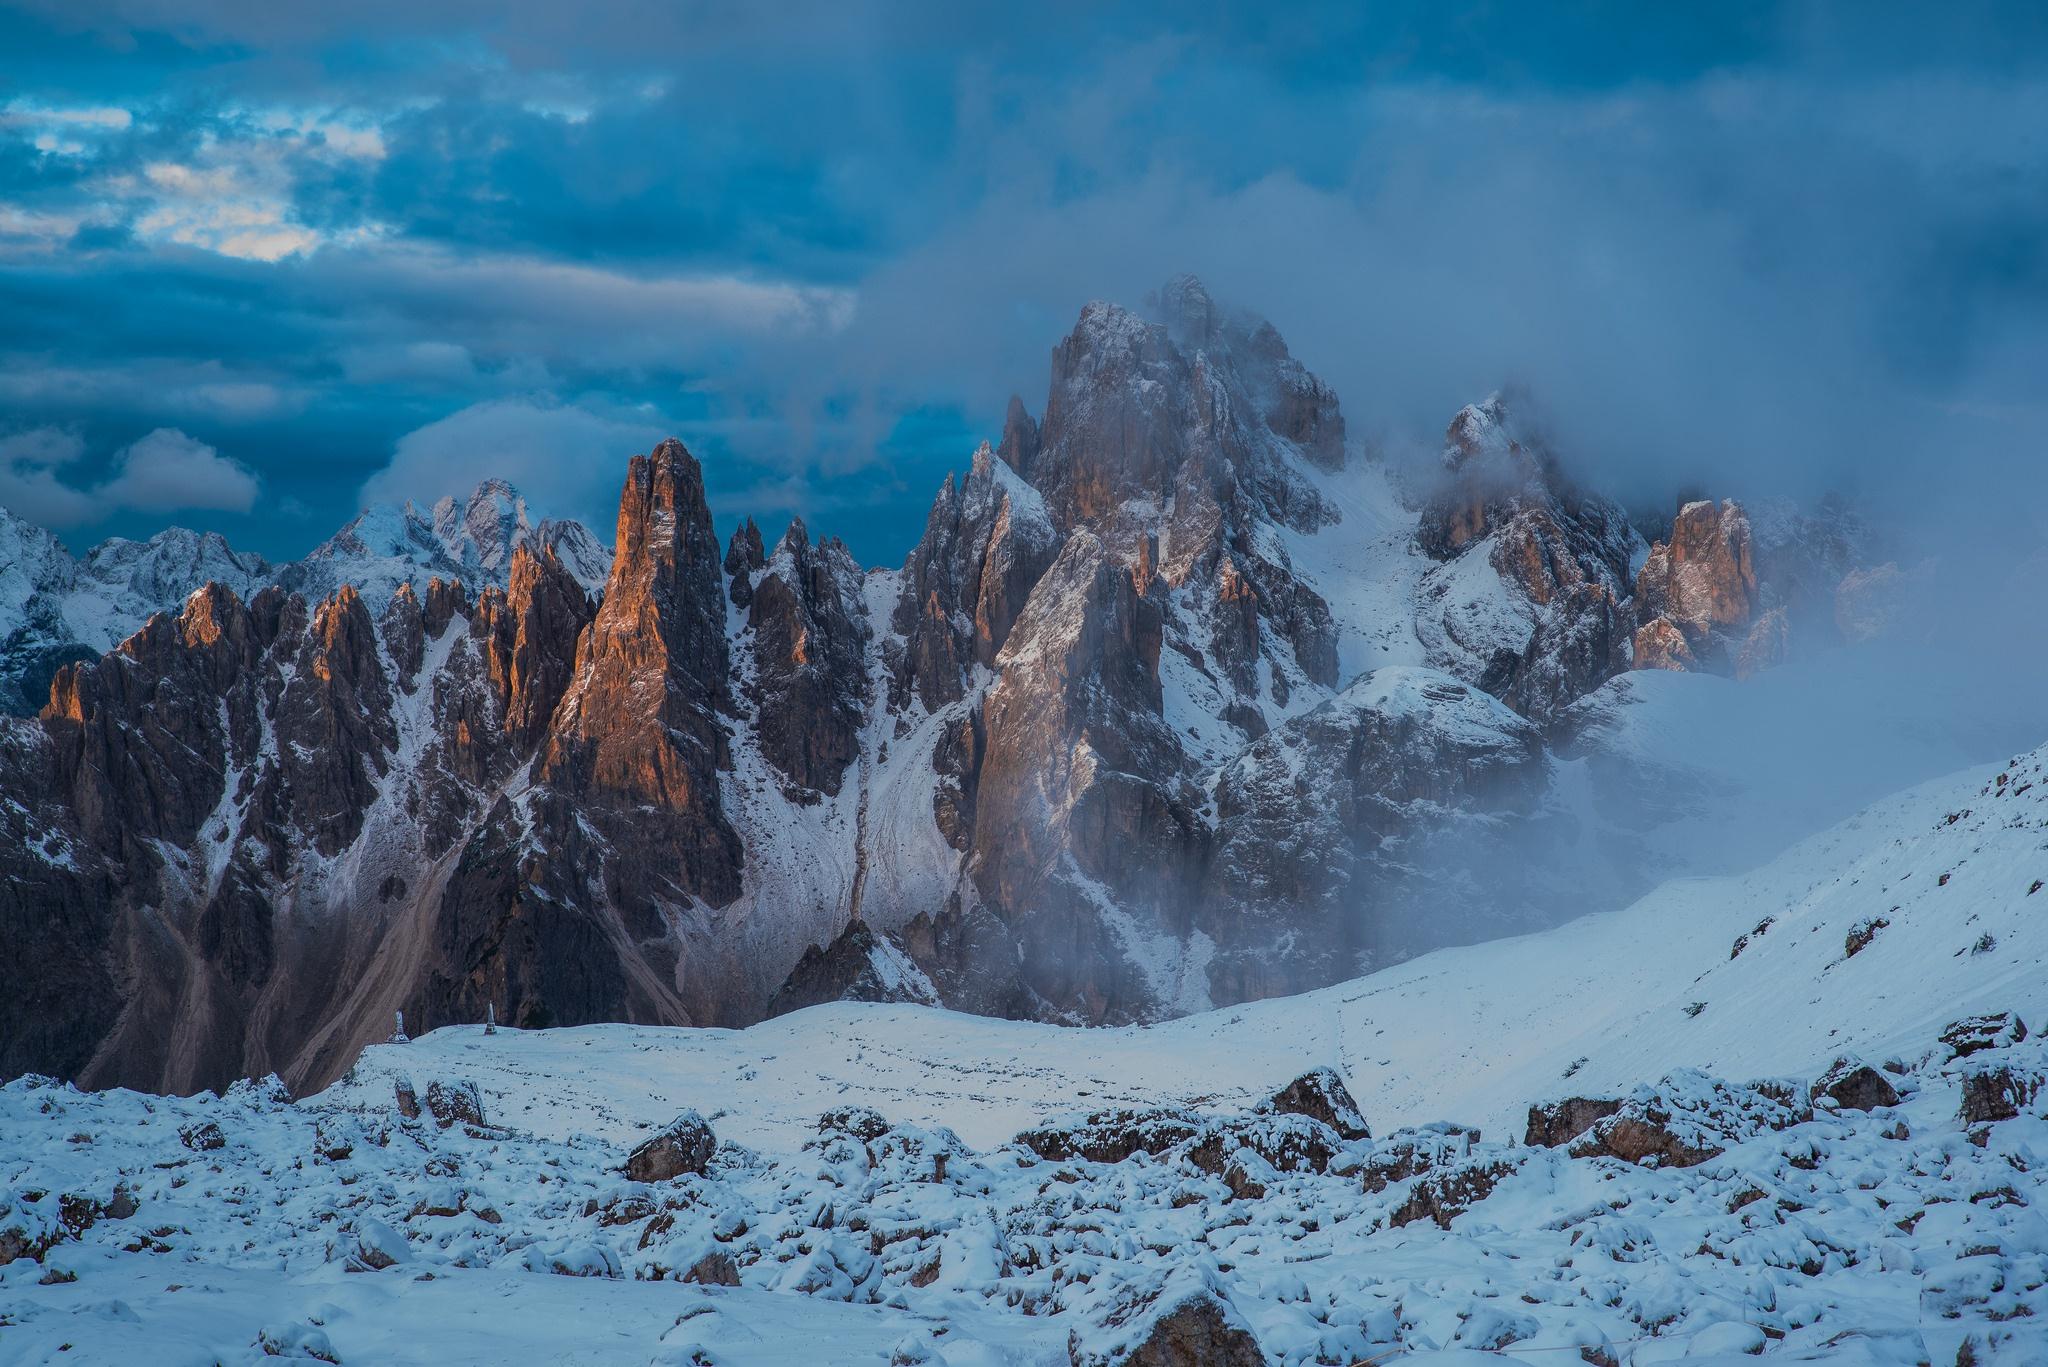 Cloud Mountain Nature Peak Snow 2048x1367